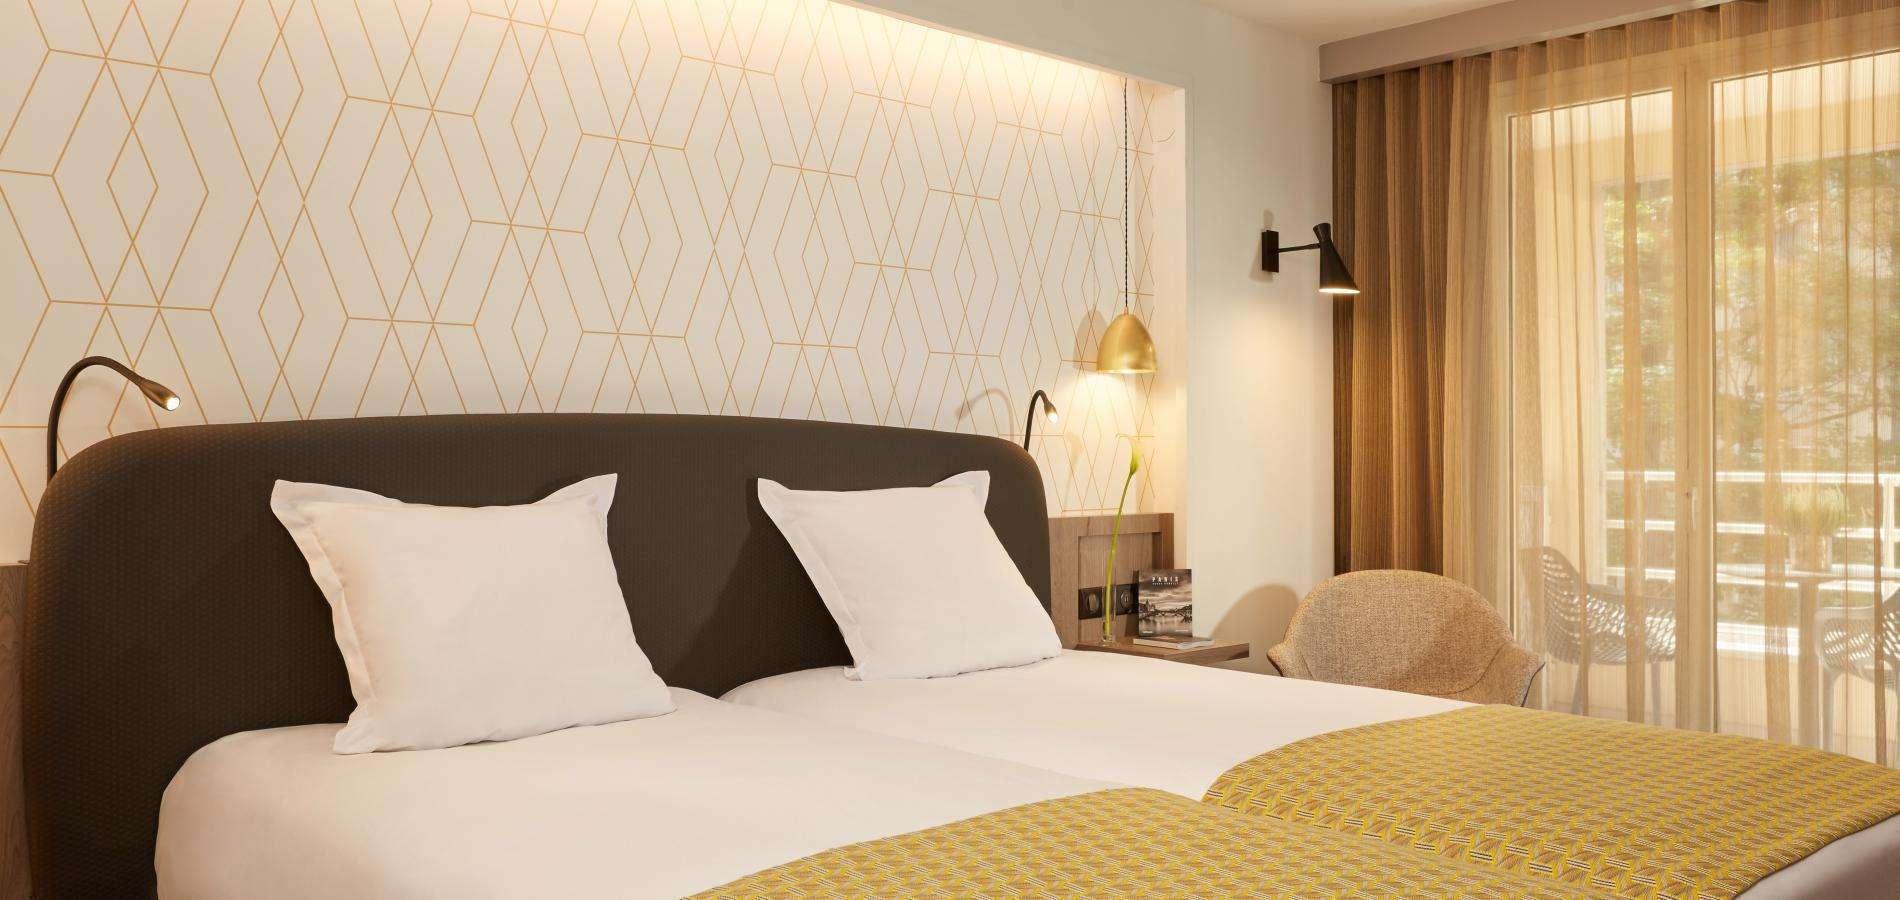 Oferta-habitacion-hotel-Auteuil-Tour Eiffel-paris